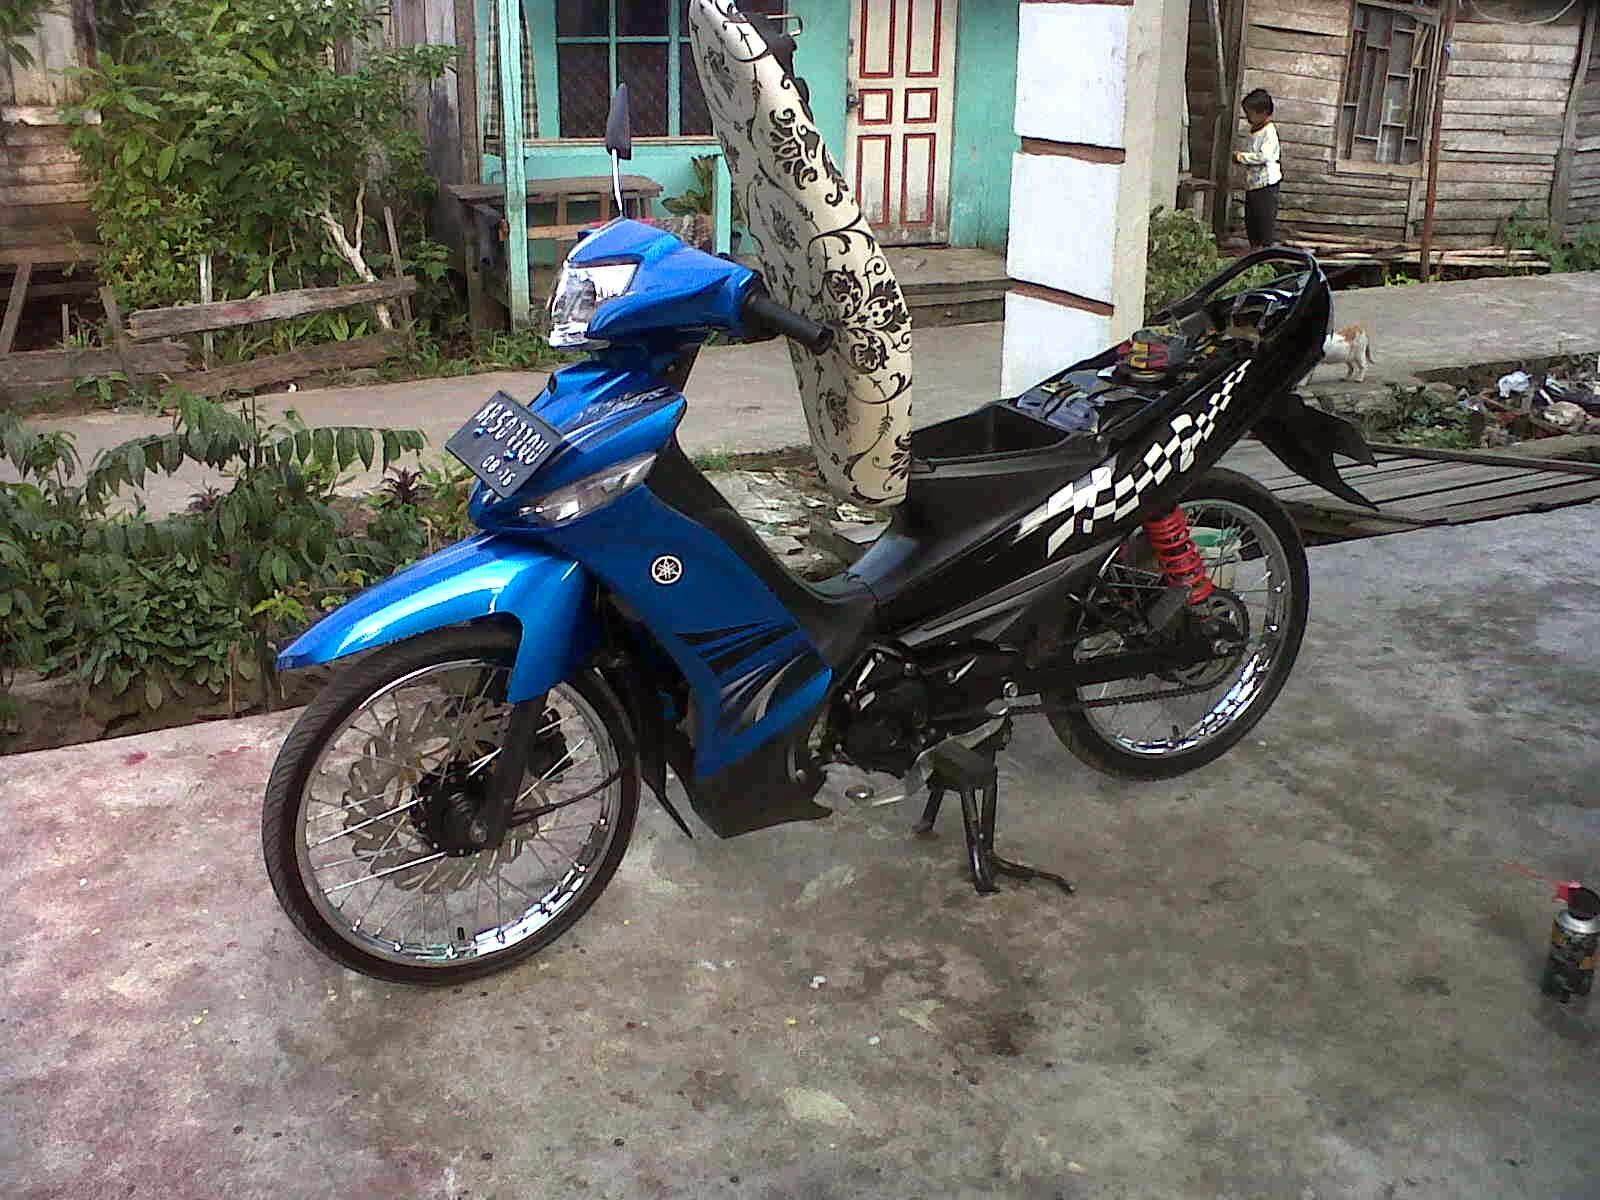 93 Modif Motor Vega Zr Warna Biru Terkeren